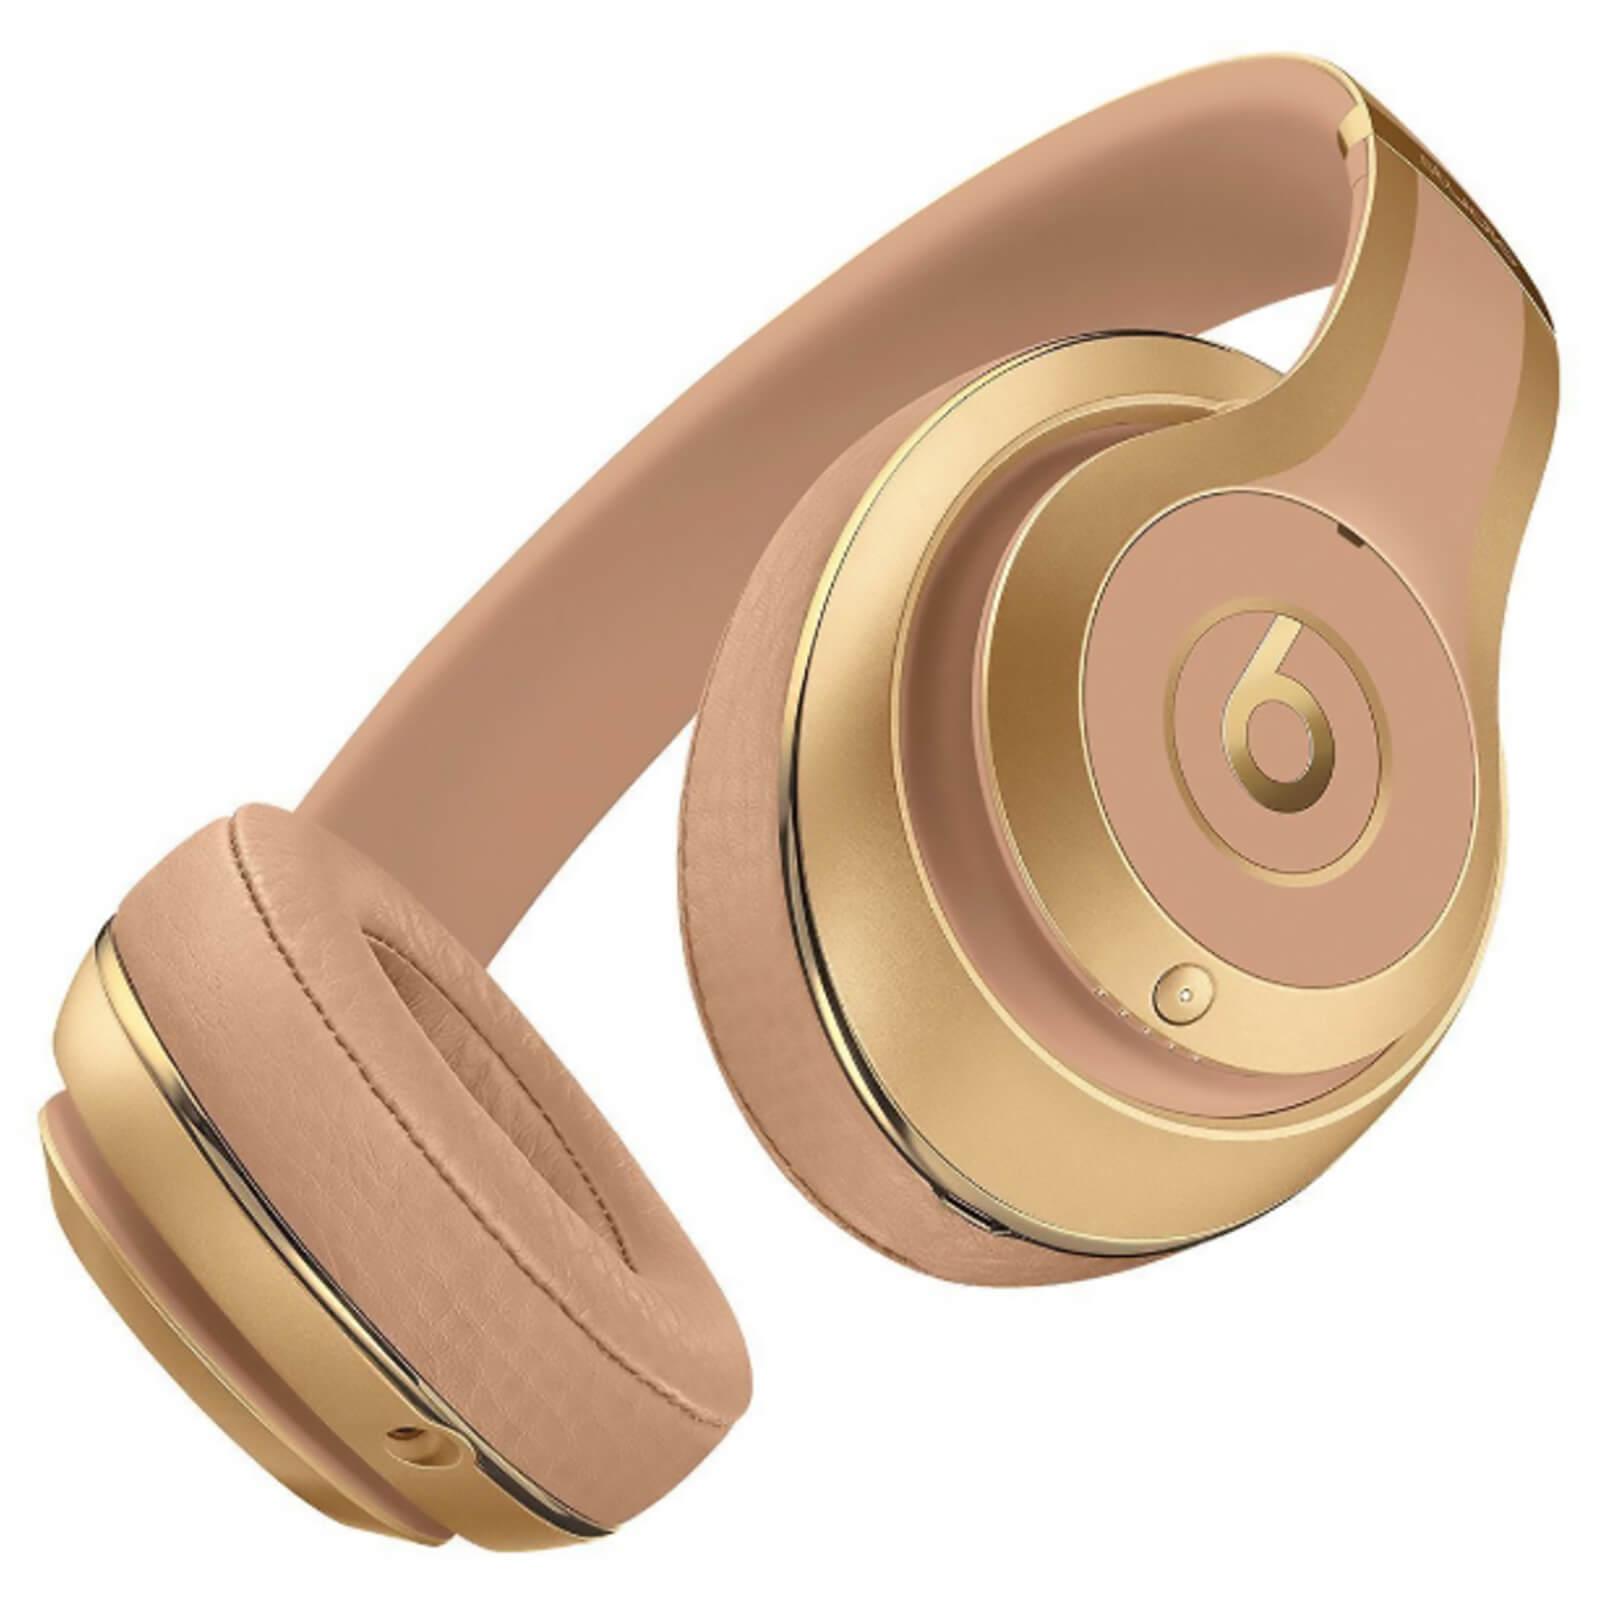 87adb4d0b20 Beats by Dr. Dre Studio 2 Wireless Noise Cancelling Headphones - Balmain  Limited Edition - Rose Gold Electronics | Zavvi